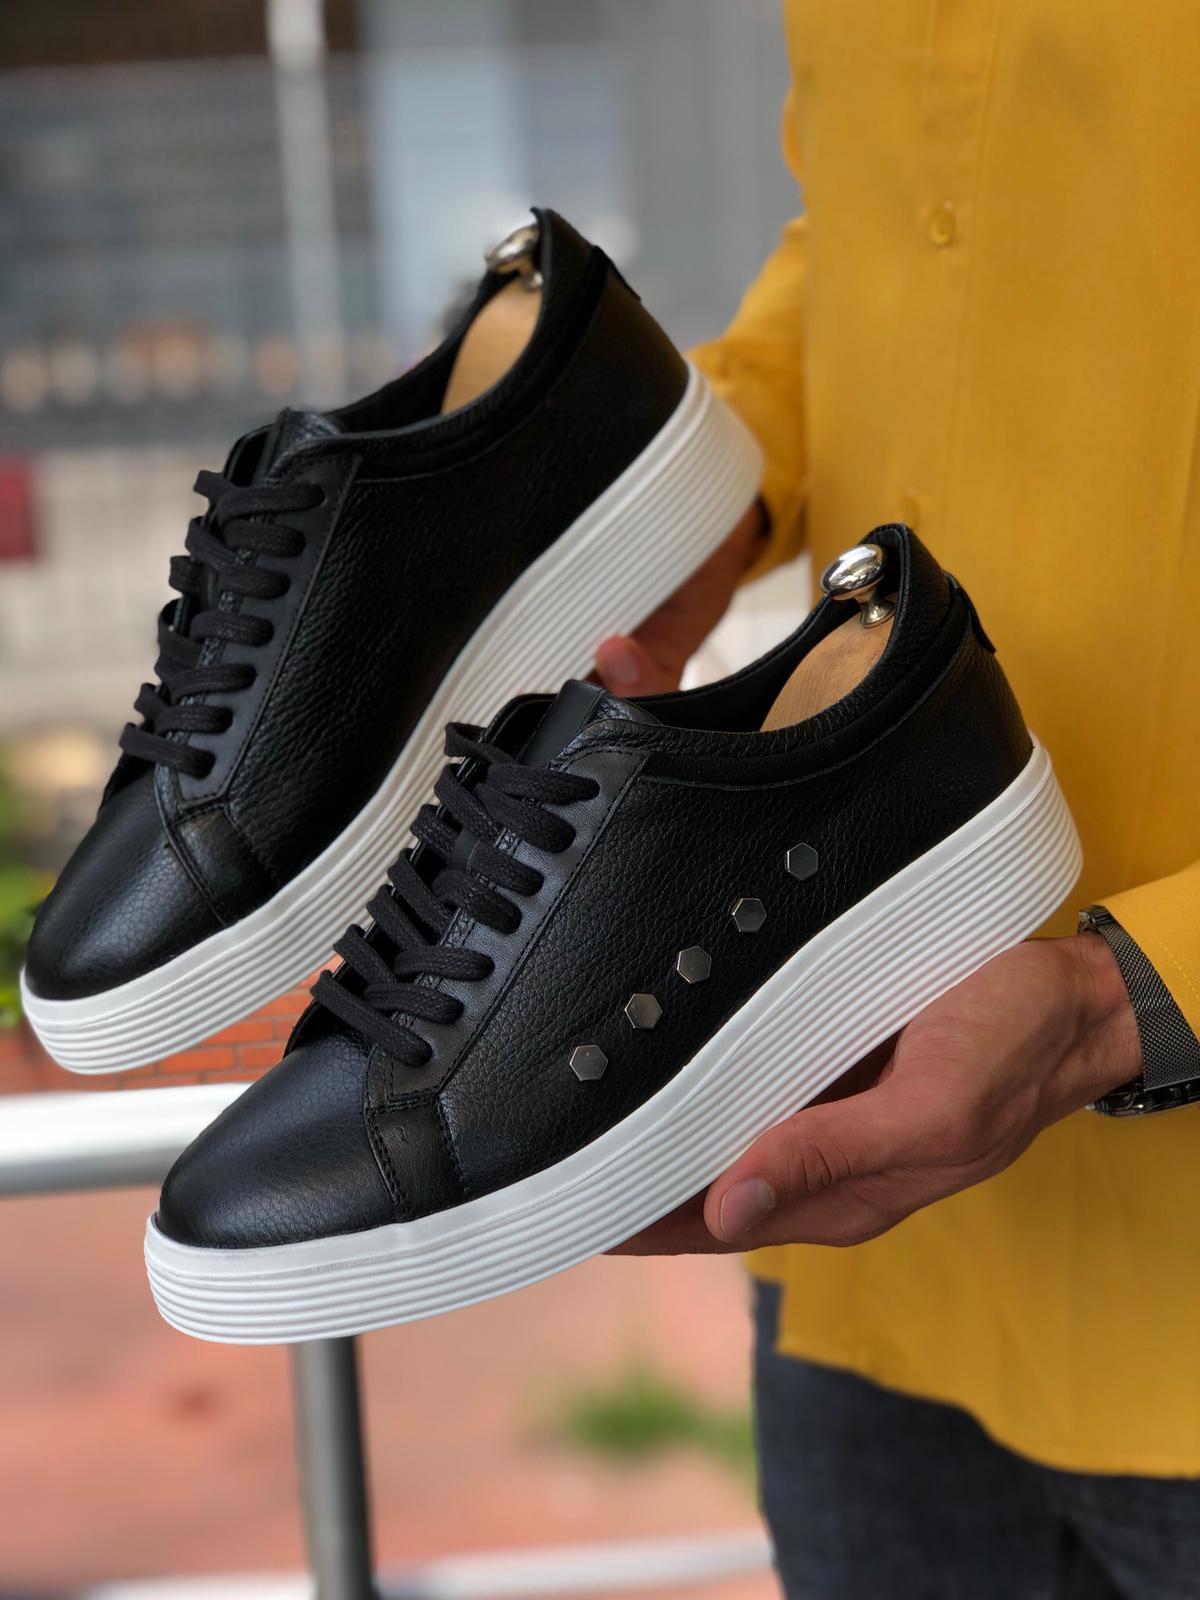 Low Top Skate Sneakers by Sardinelli